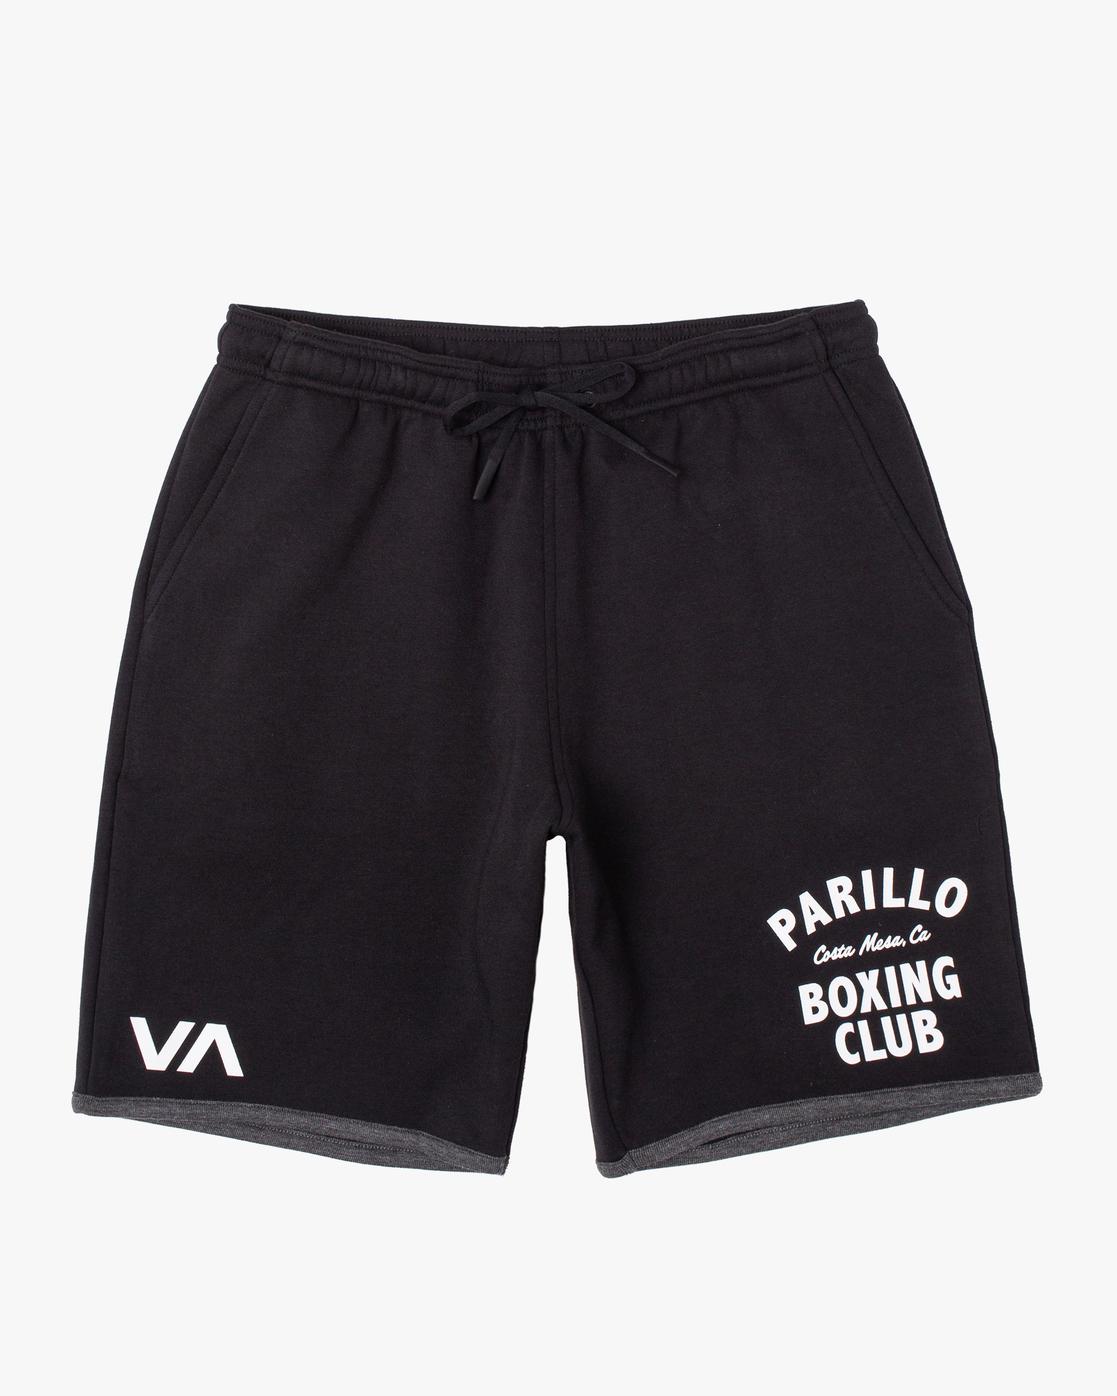 0 VA Sport - Performance Training Shorts for Men Black X4WKMIRVS1 RVCA